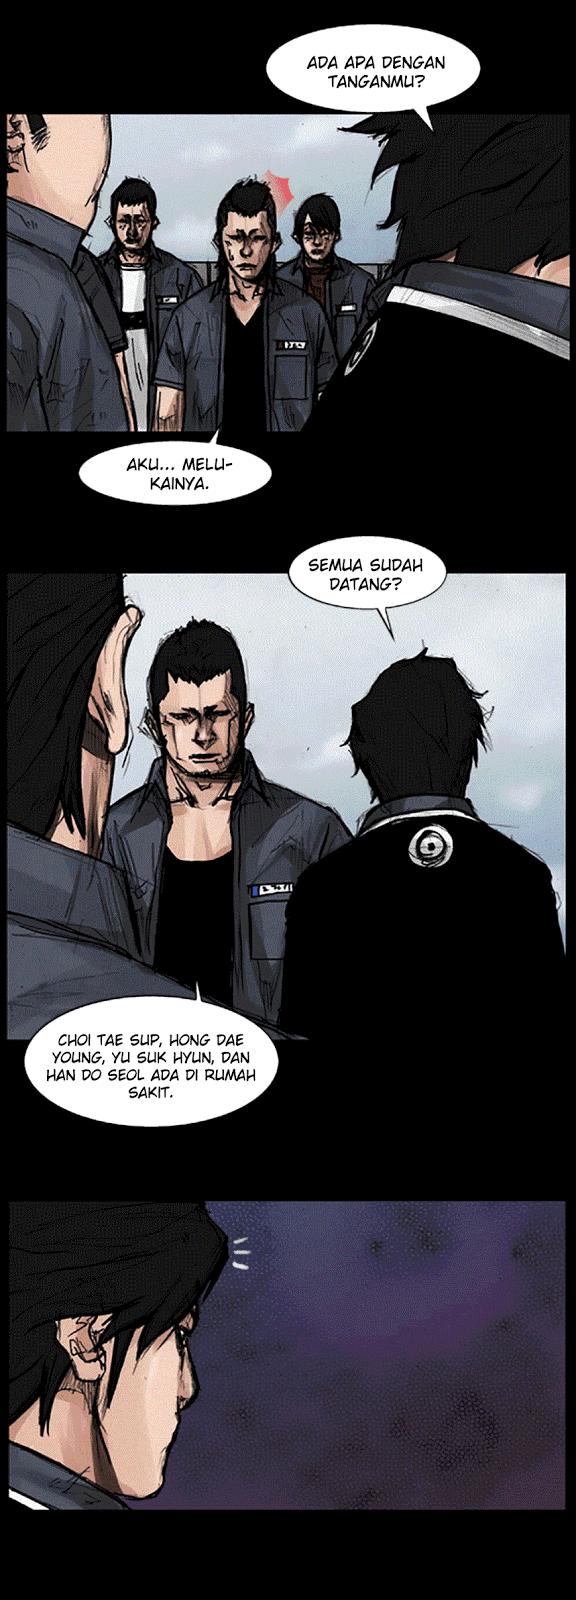 Komik dokgo 041 - chapter 41 42 Indonesia dokgo 041 - chapter 41 Terbaru 9|Baca Manga Komik Indonesia